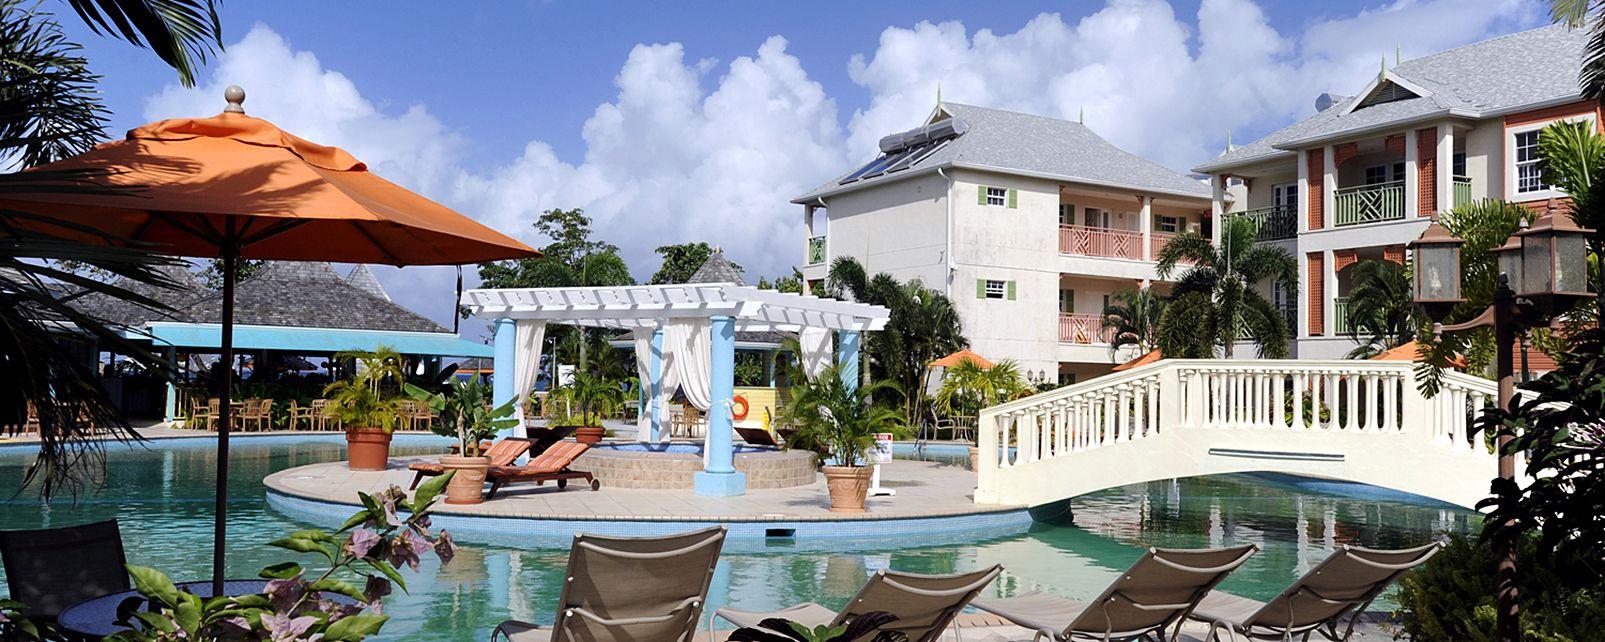 Hotel Bay Gardens Beach Resort